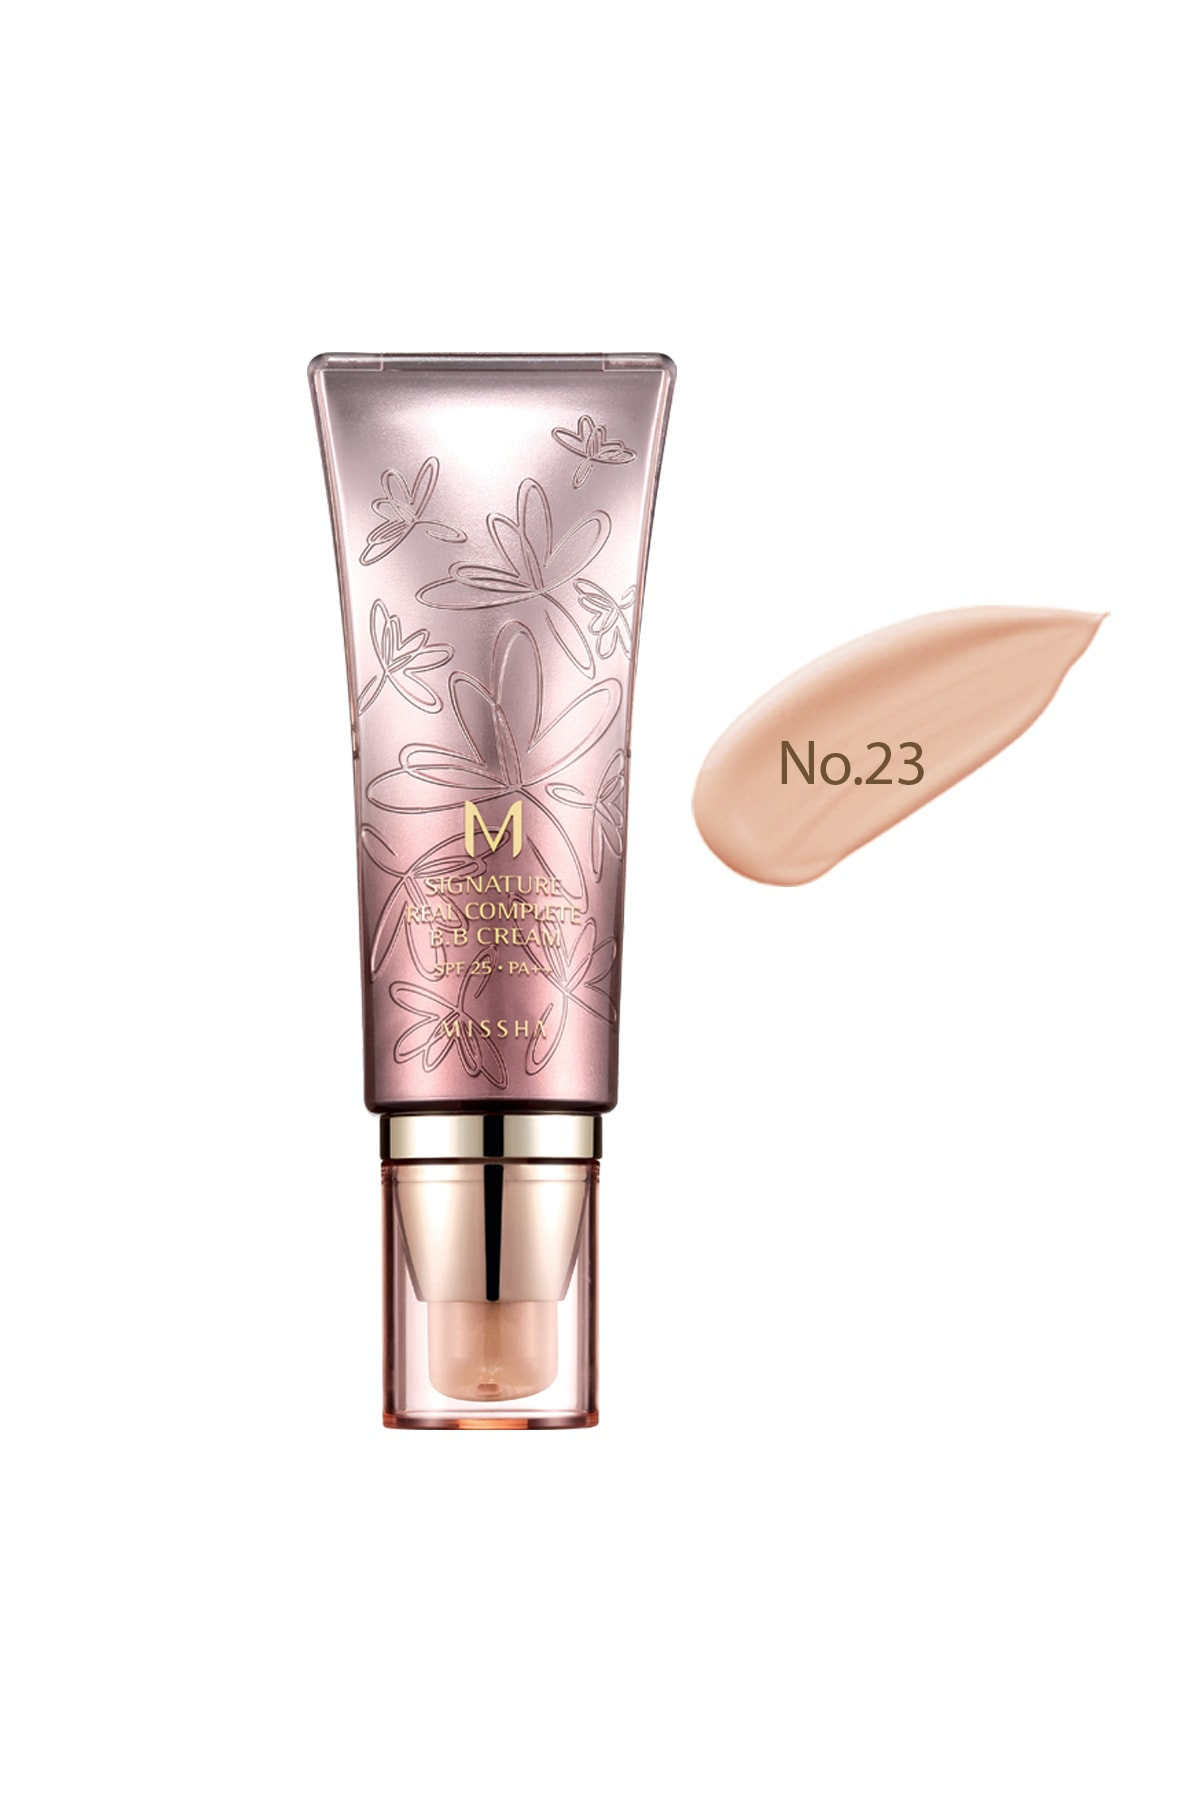 Missha Hassas Ciltler İçin BB Krem SPF25/PA++ Signature Real Complete BB Cream No: 23 (45g)